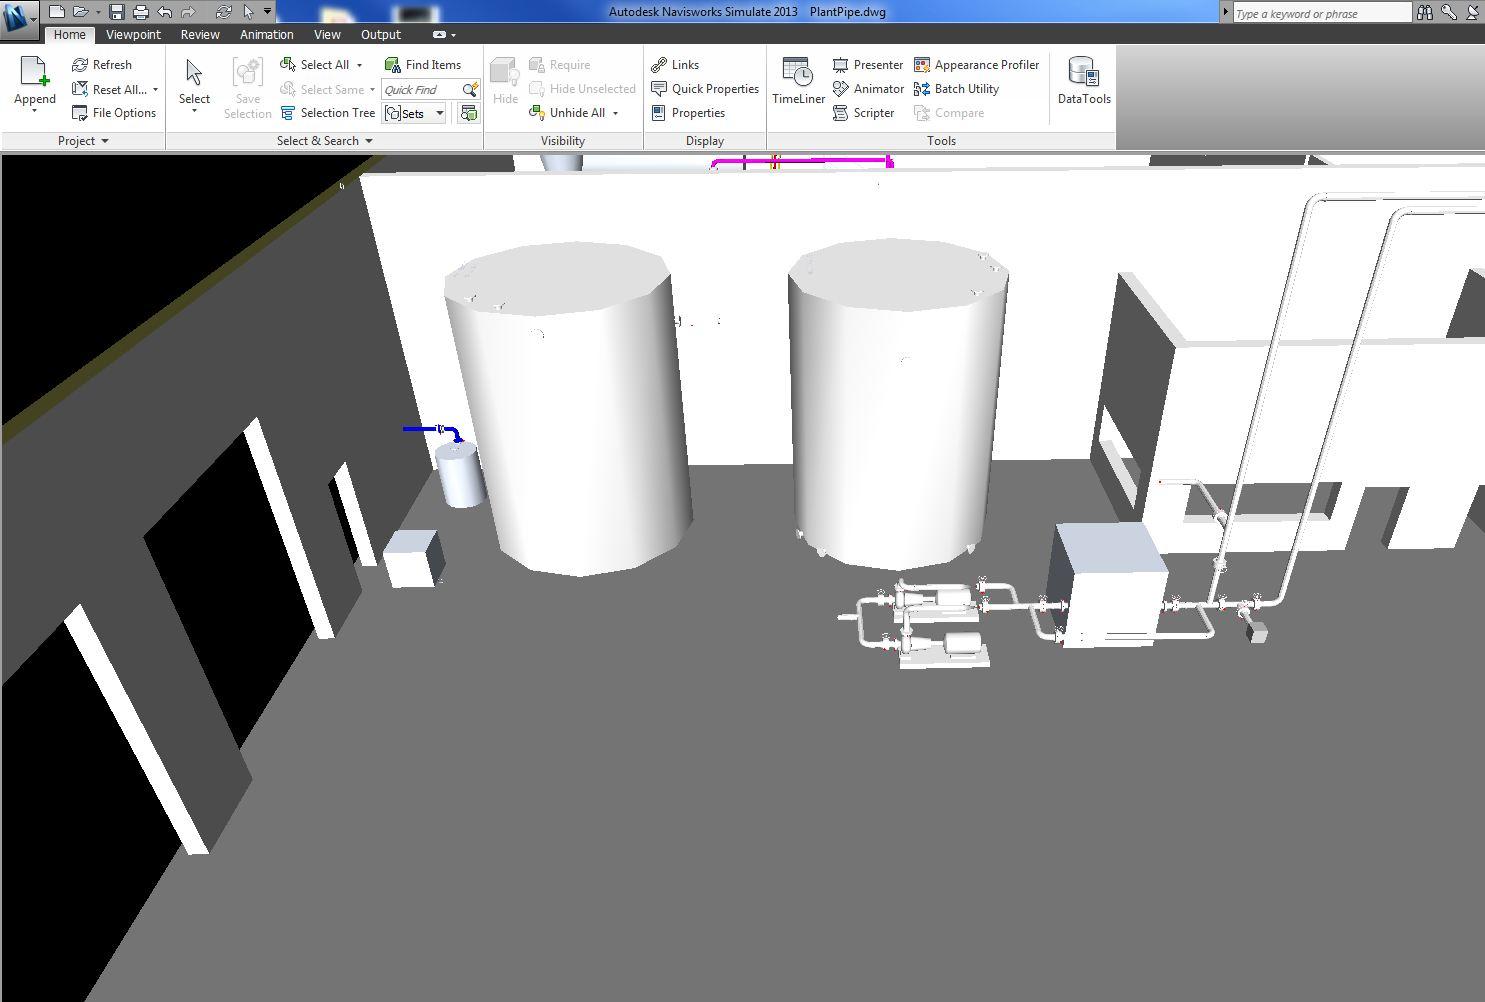 Missing Pipes in Navisworks NWD File - Autodesk Community